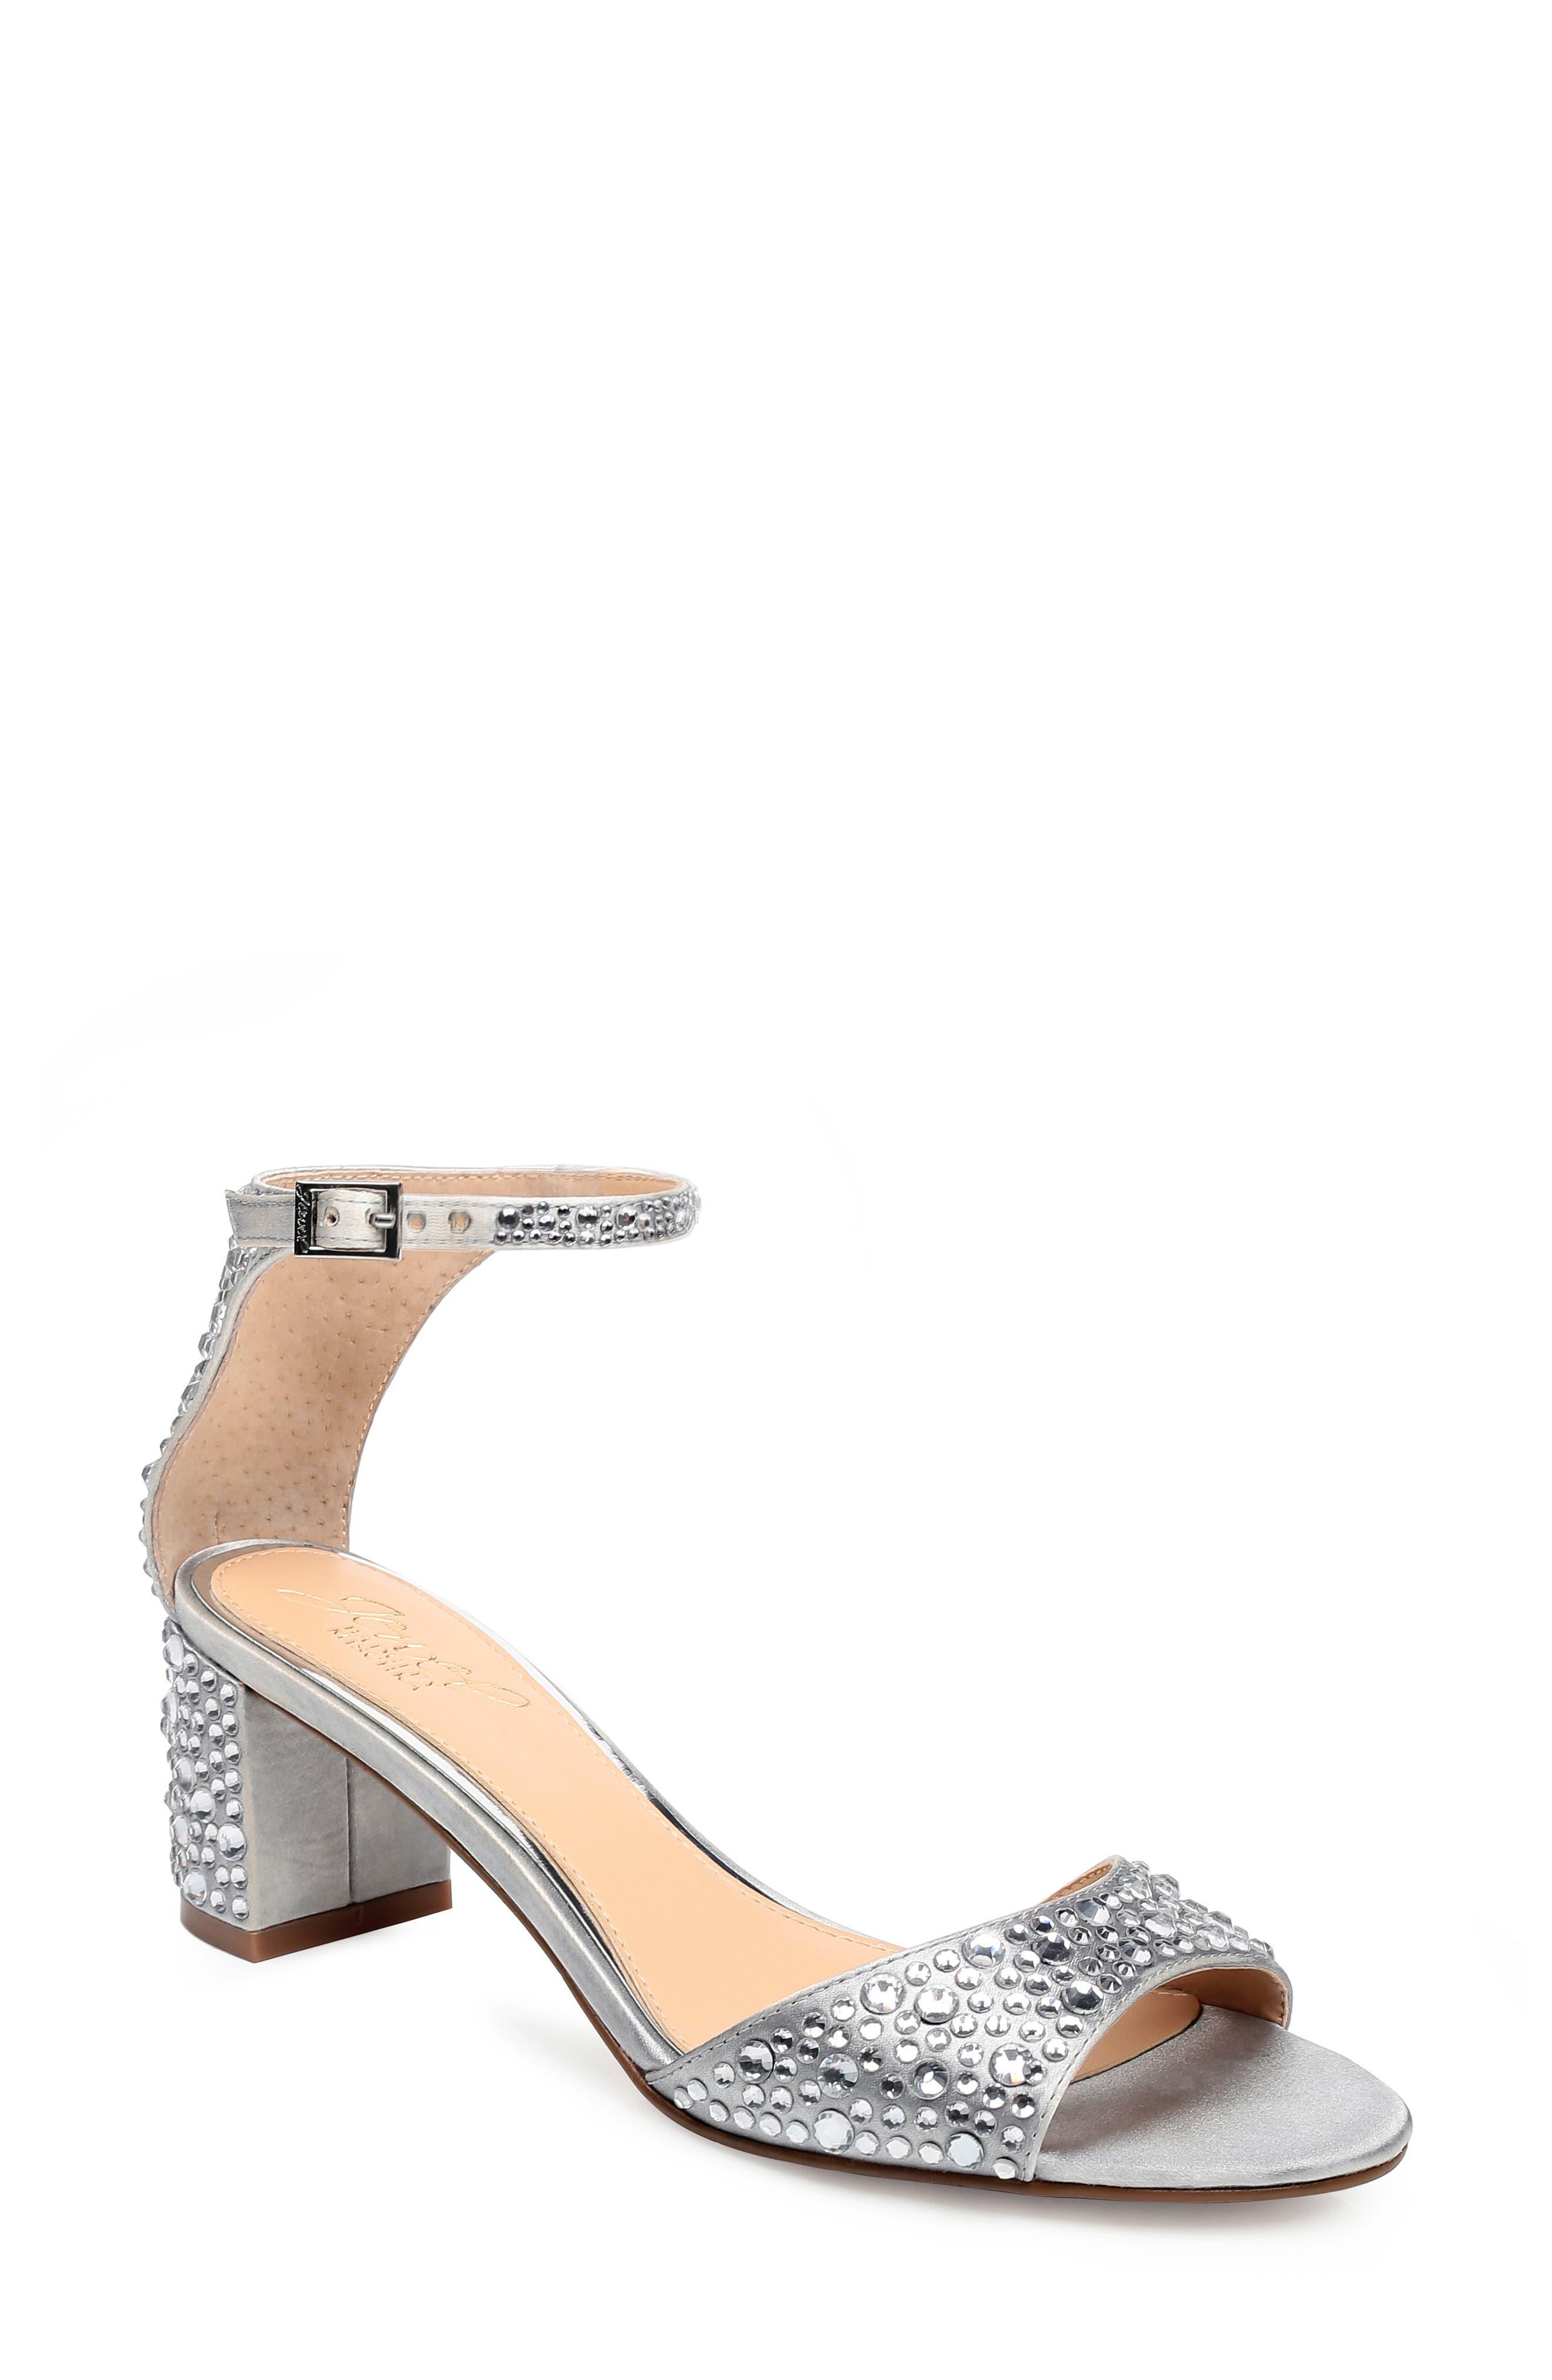 Crystal Block Heel Sandal, Main, color, SILVER CRYSTAL SATIN